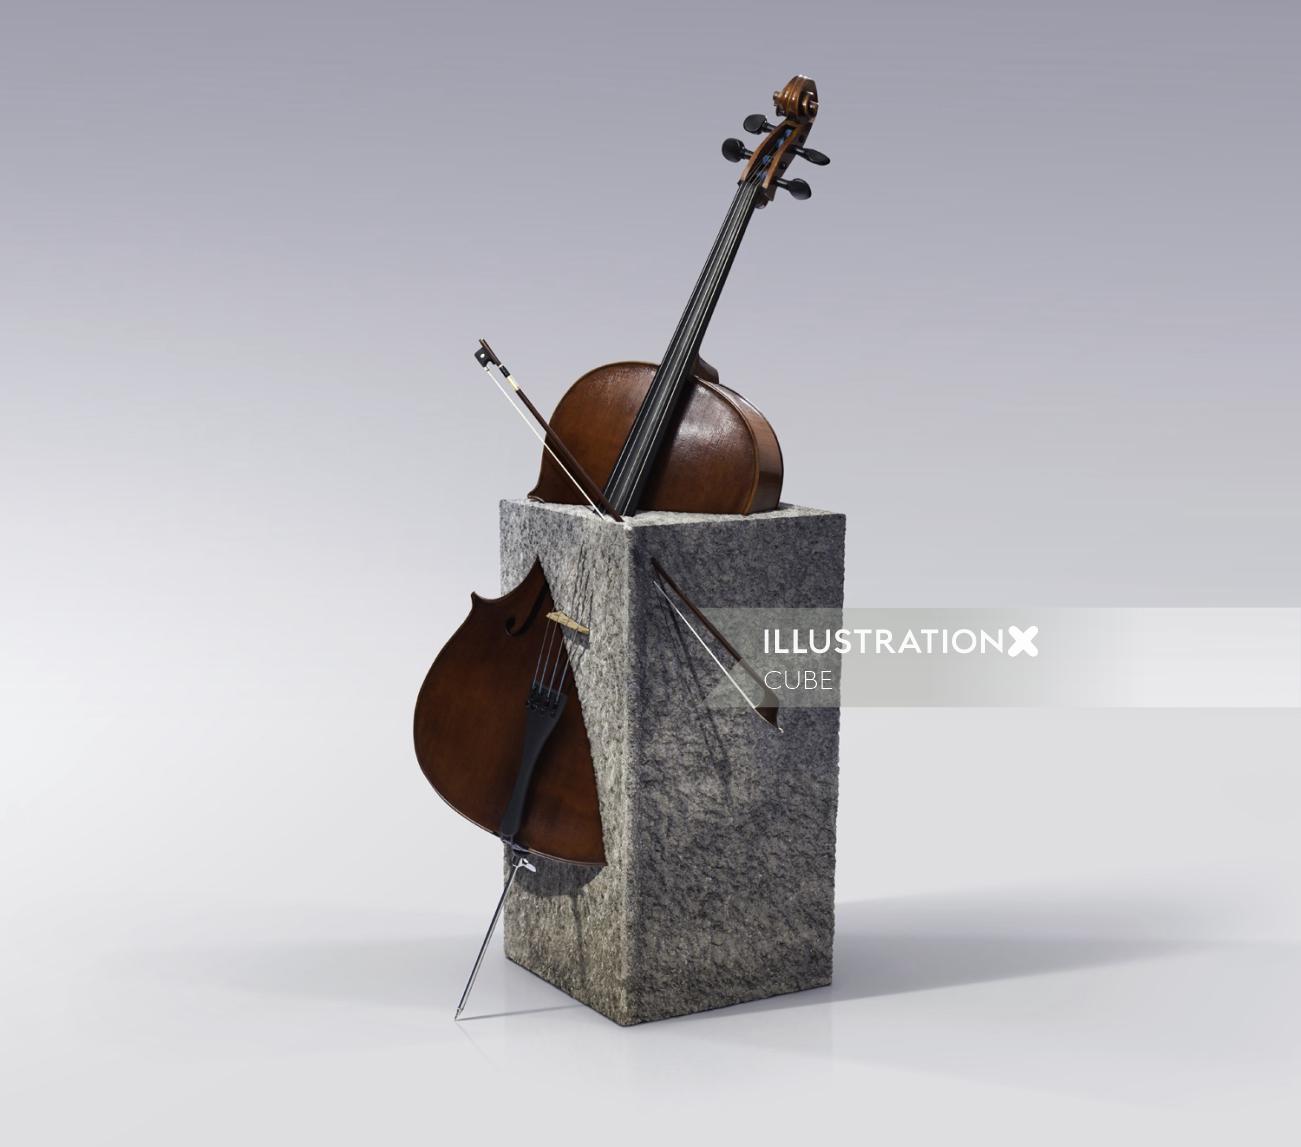 Surreal illustration of violin